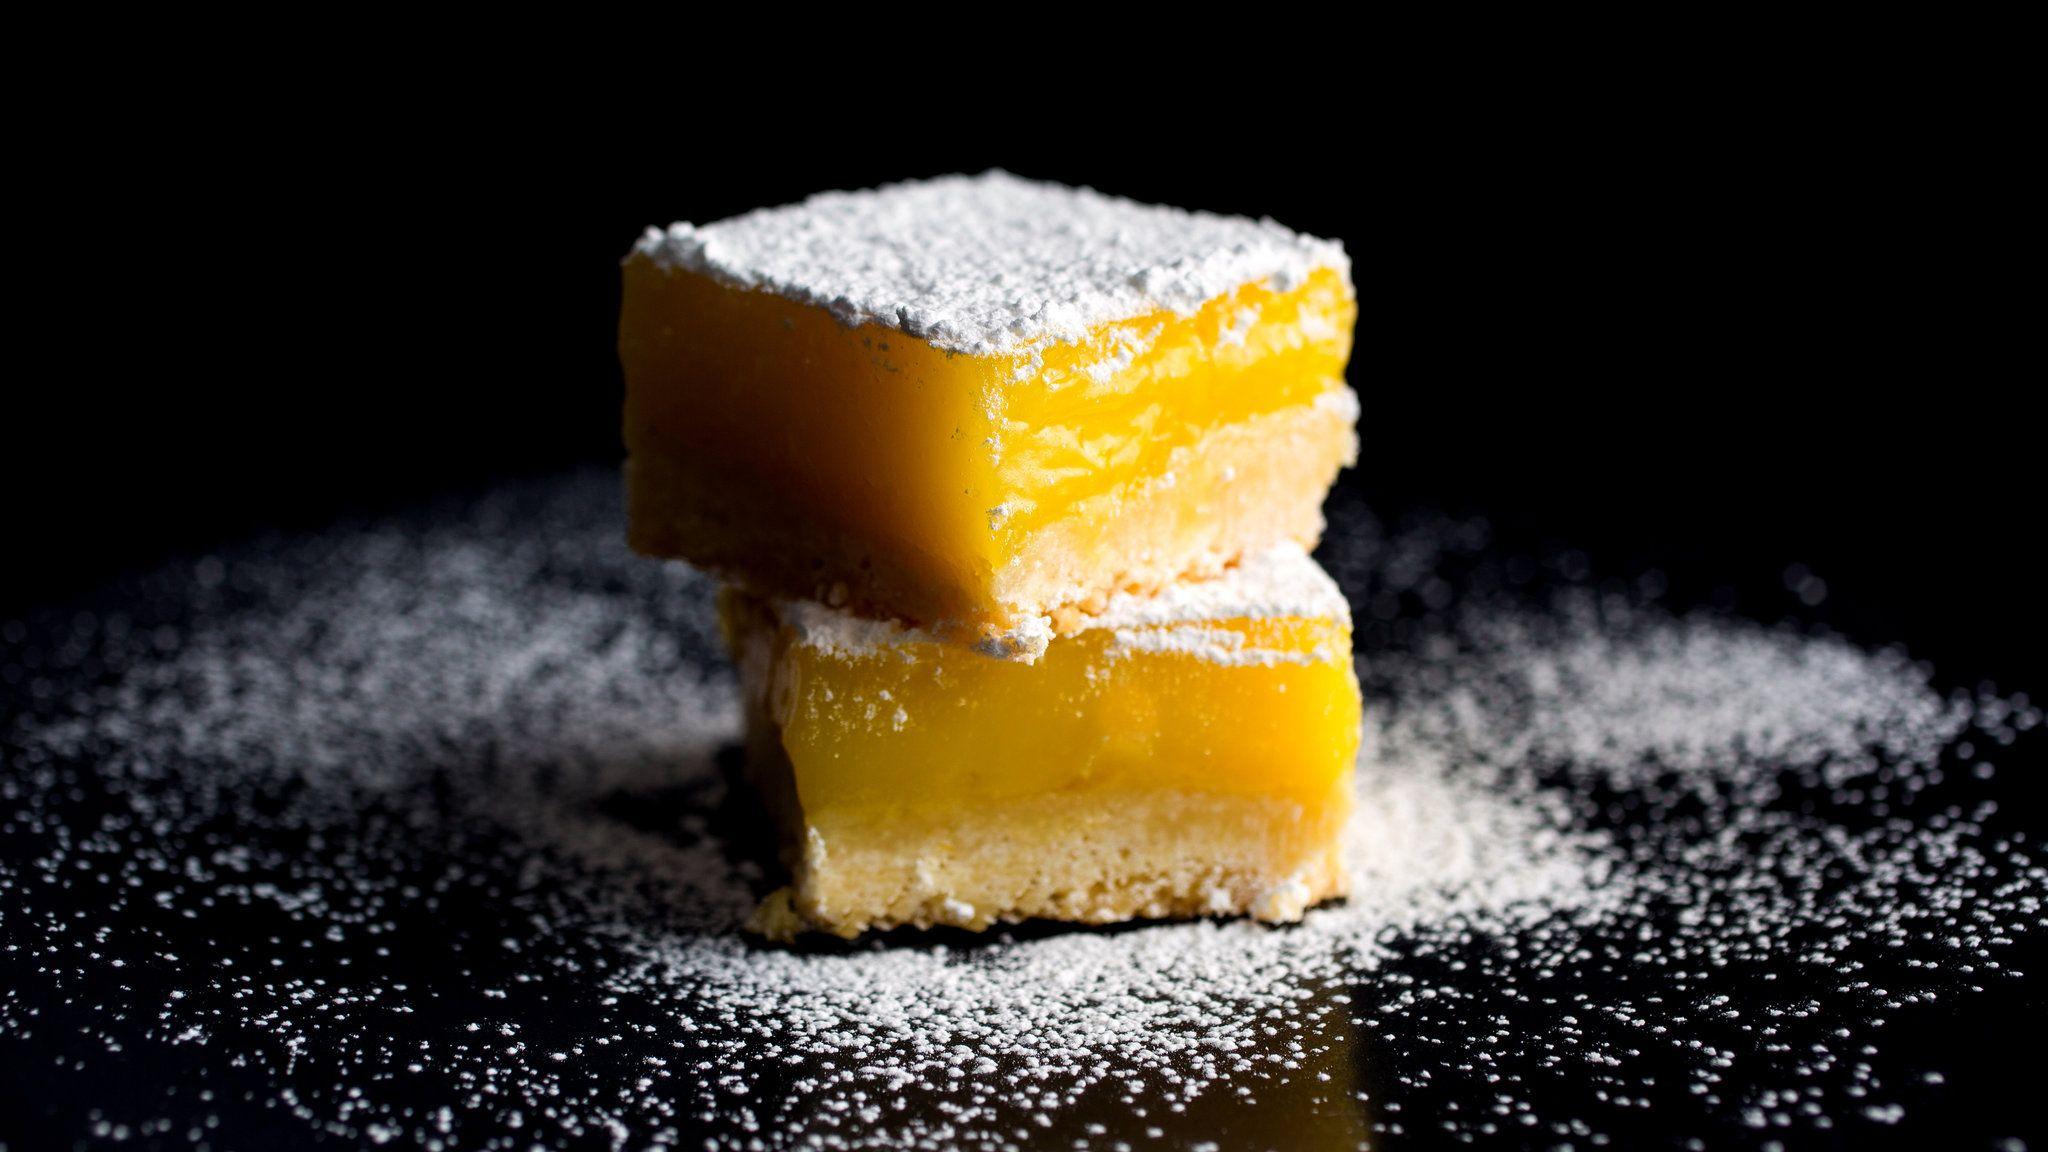 Lemon Bars With Olive Oil And Sea Salt Recipe Recipe Desserts Lemon Bars Recipes